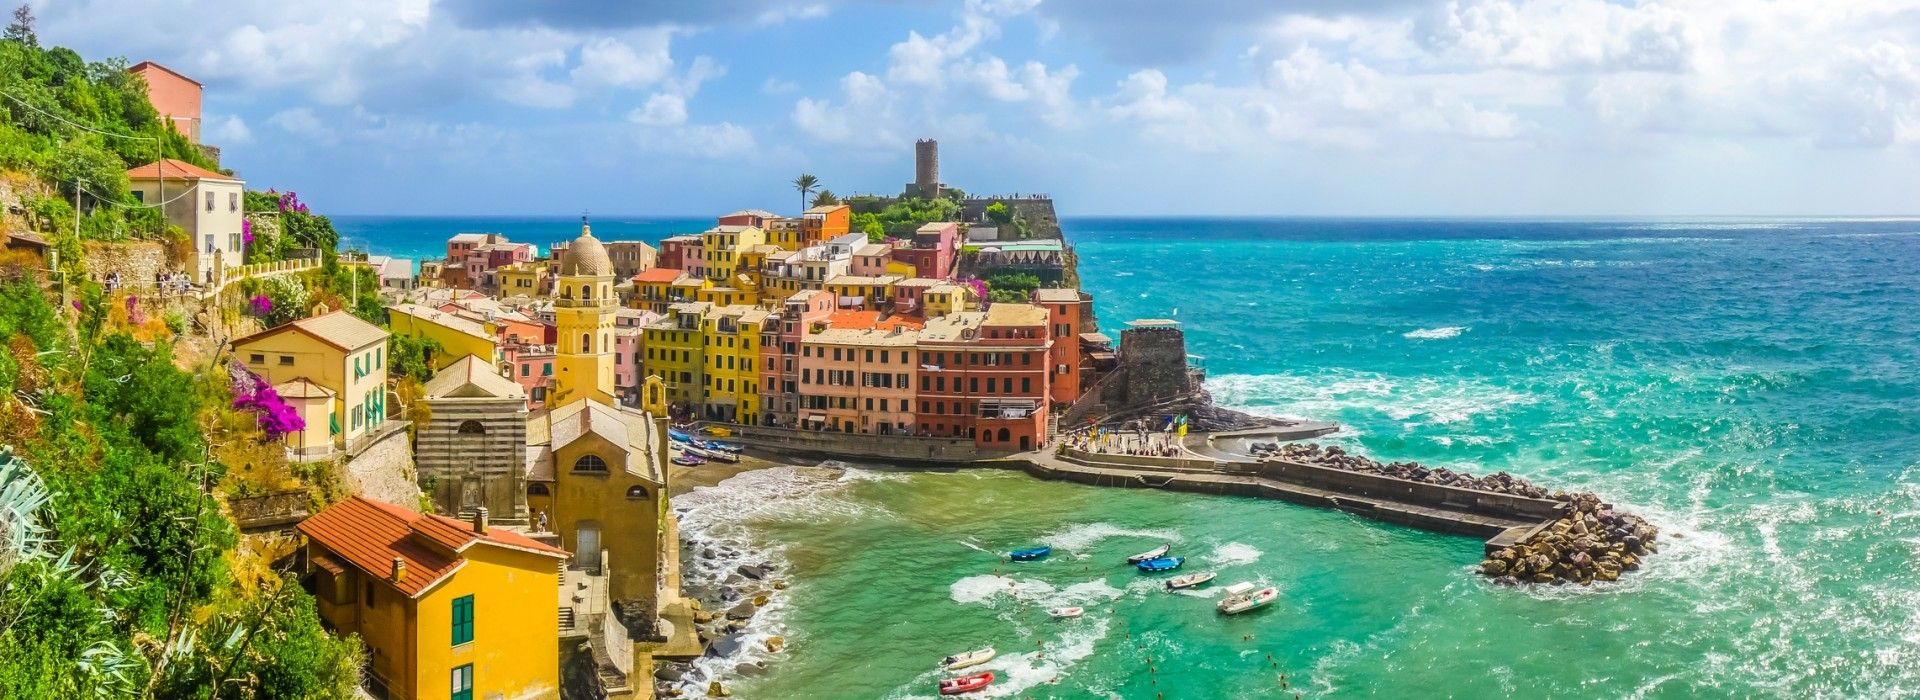 Trekking Tours in Amalfi Coast & Campania